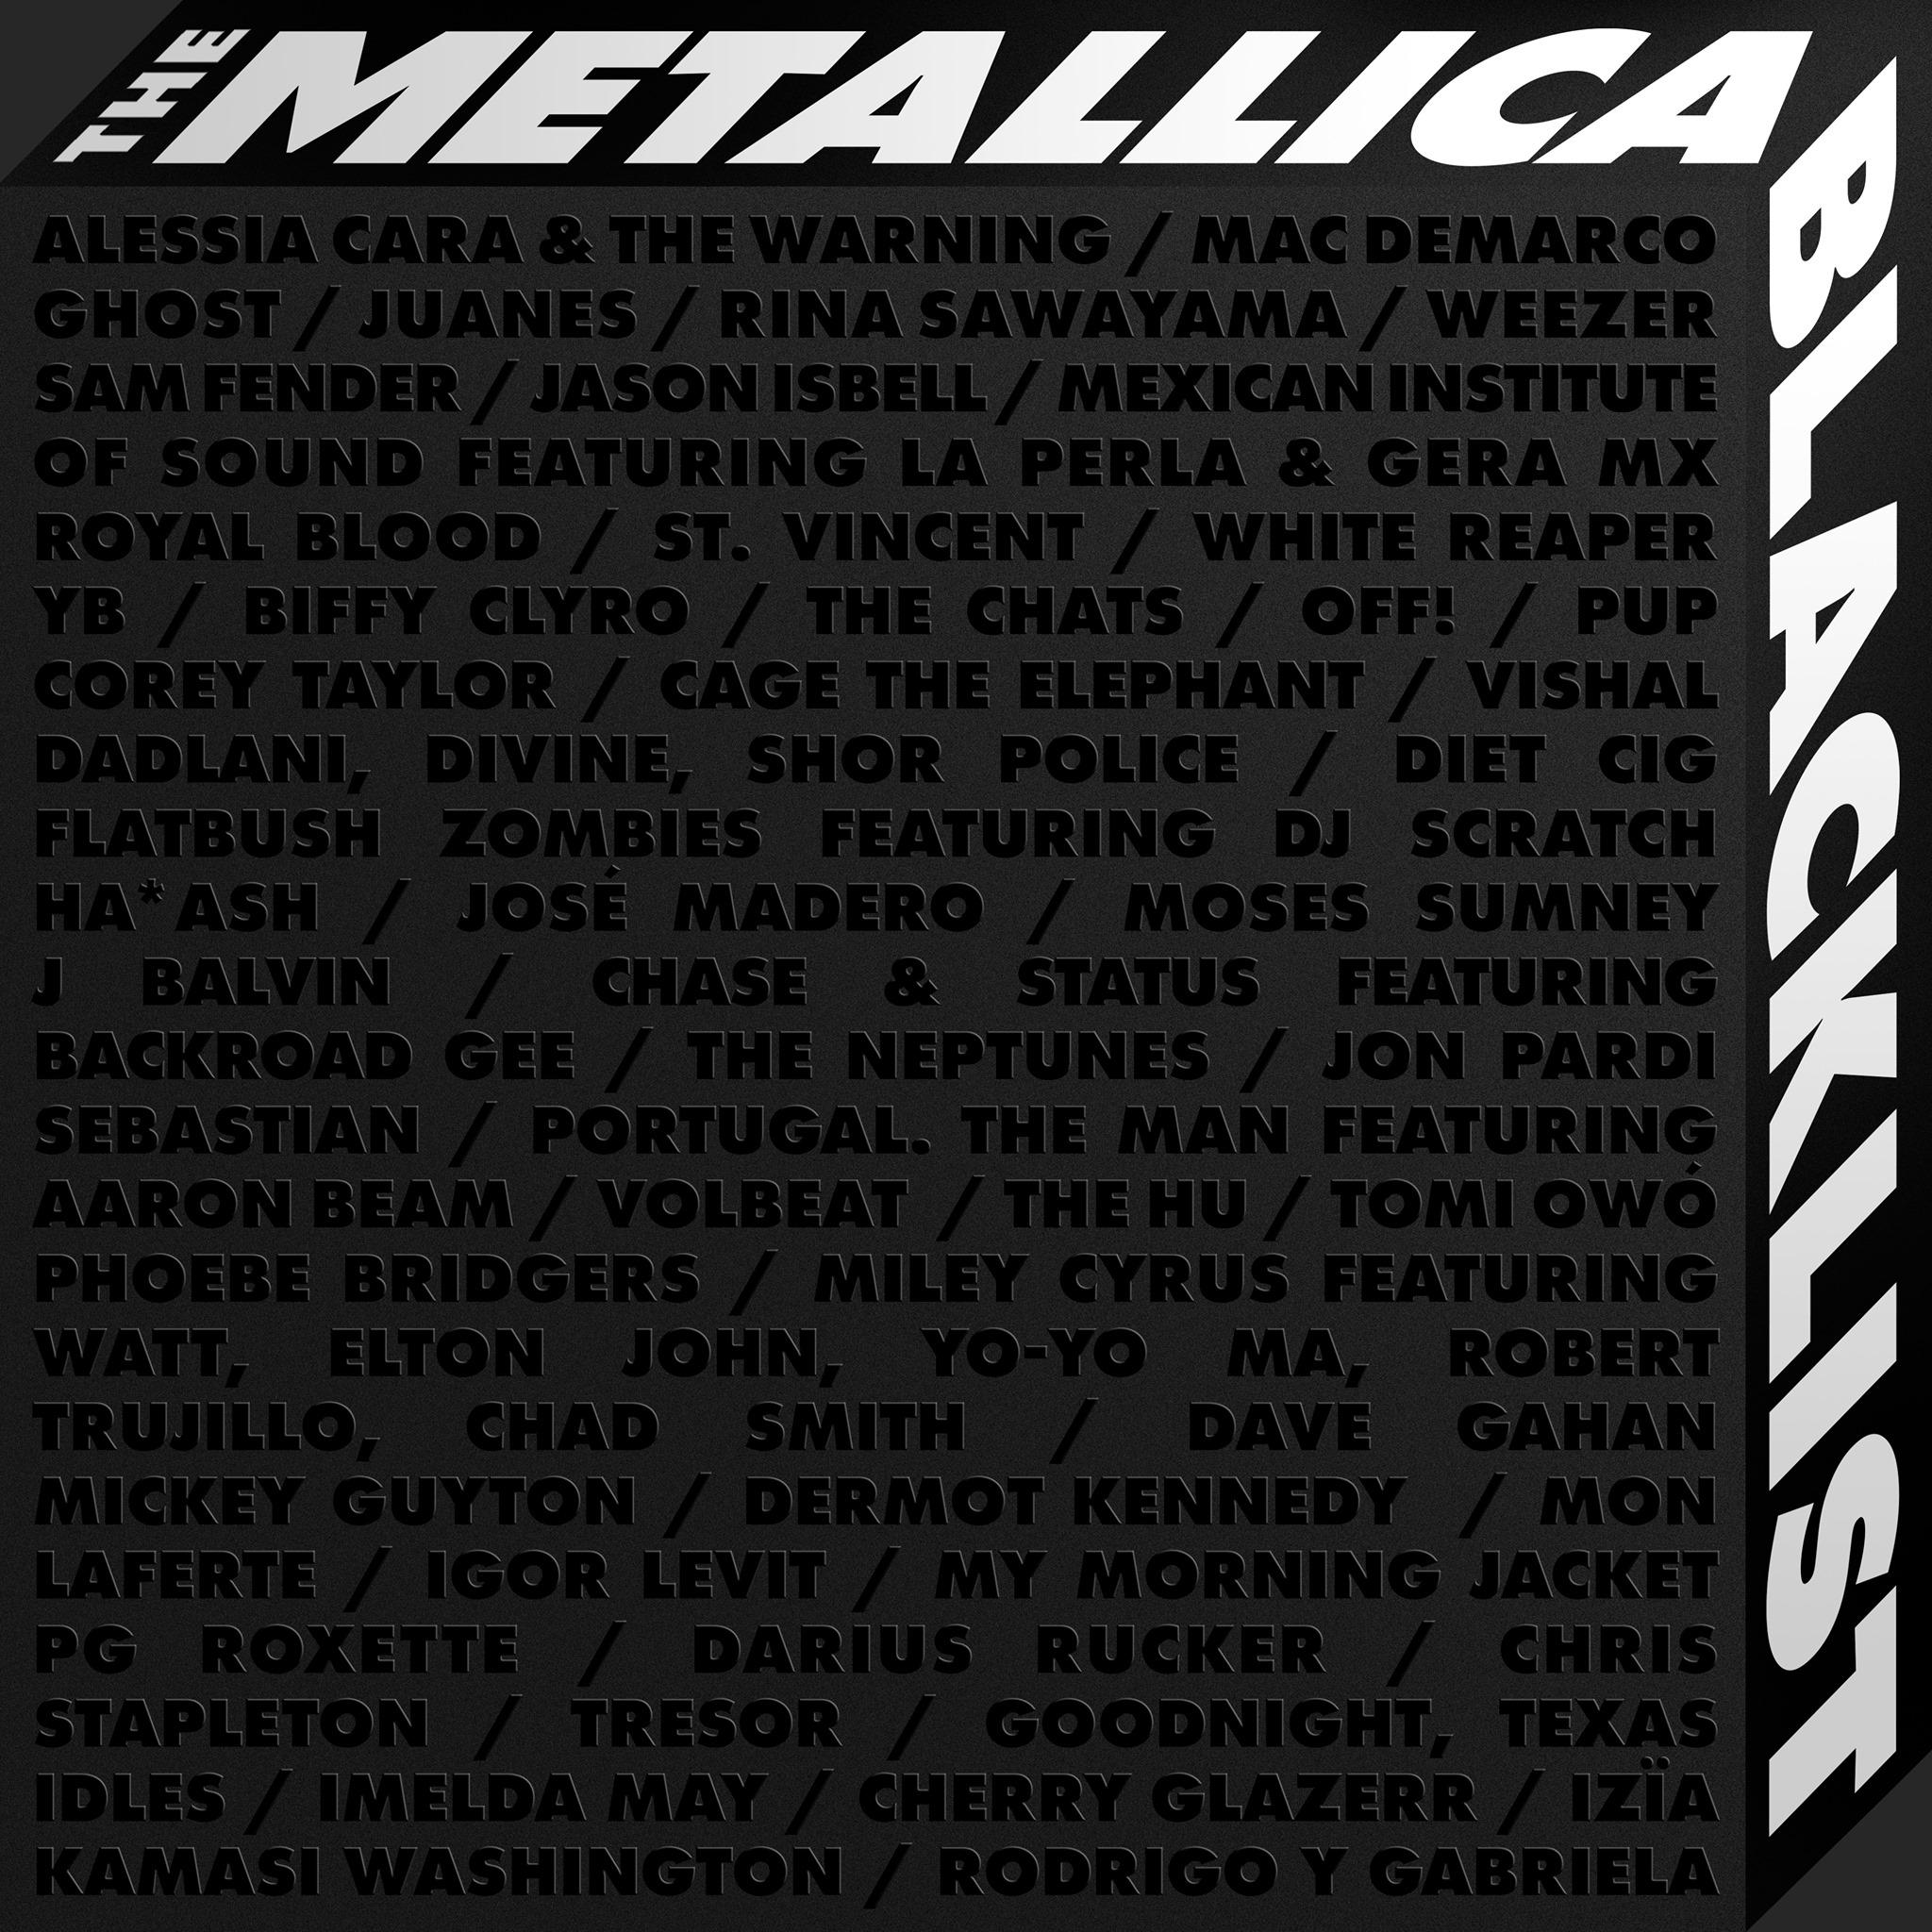 metalllica - the black list